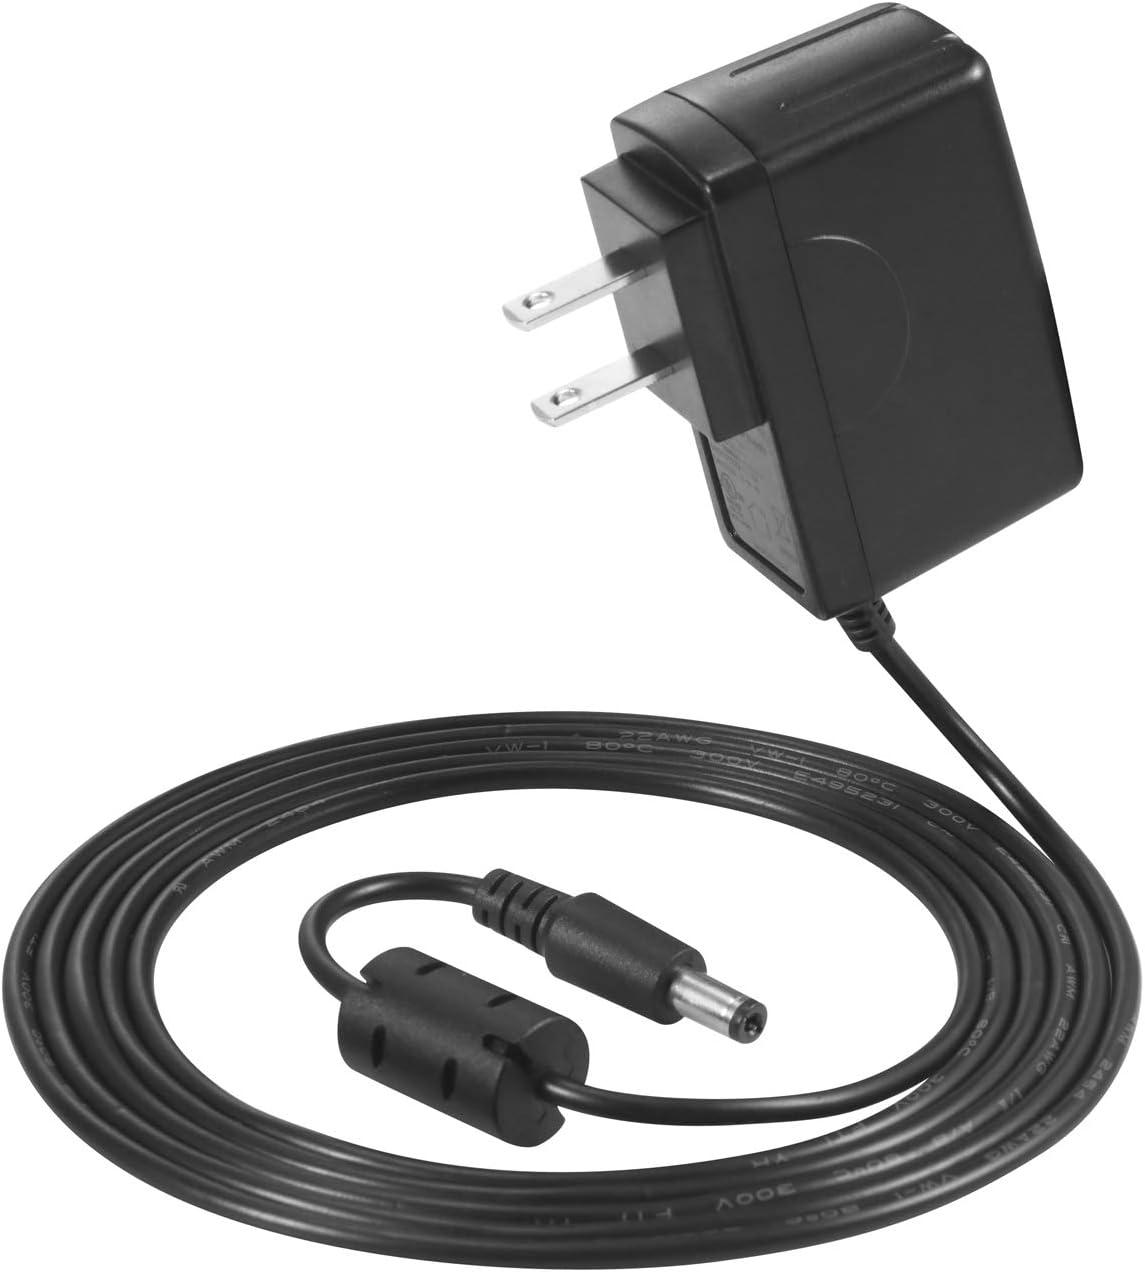 9V AC Power Adapter Supply For Casio LK-55 LK-220 CTK-671 CTK-691 Keyboard